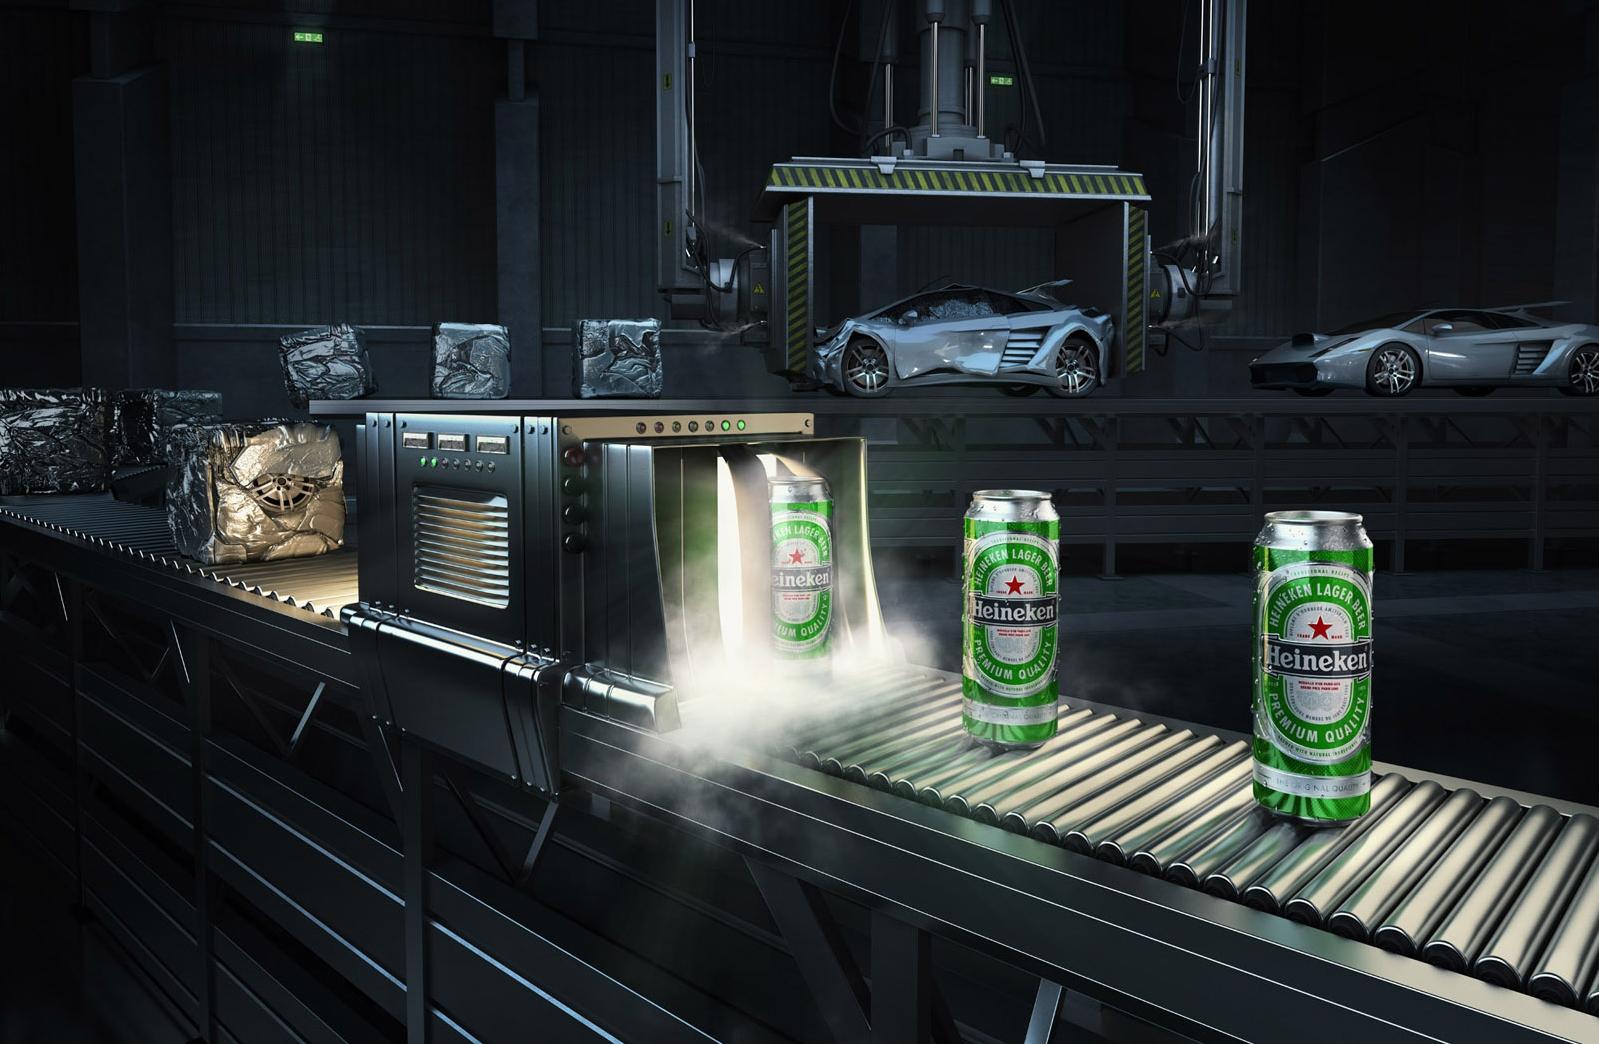 3D Heineken Conveyor Belt Drink Illustration